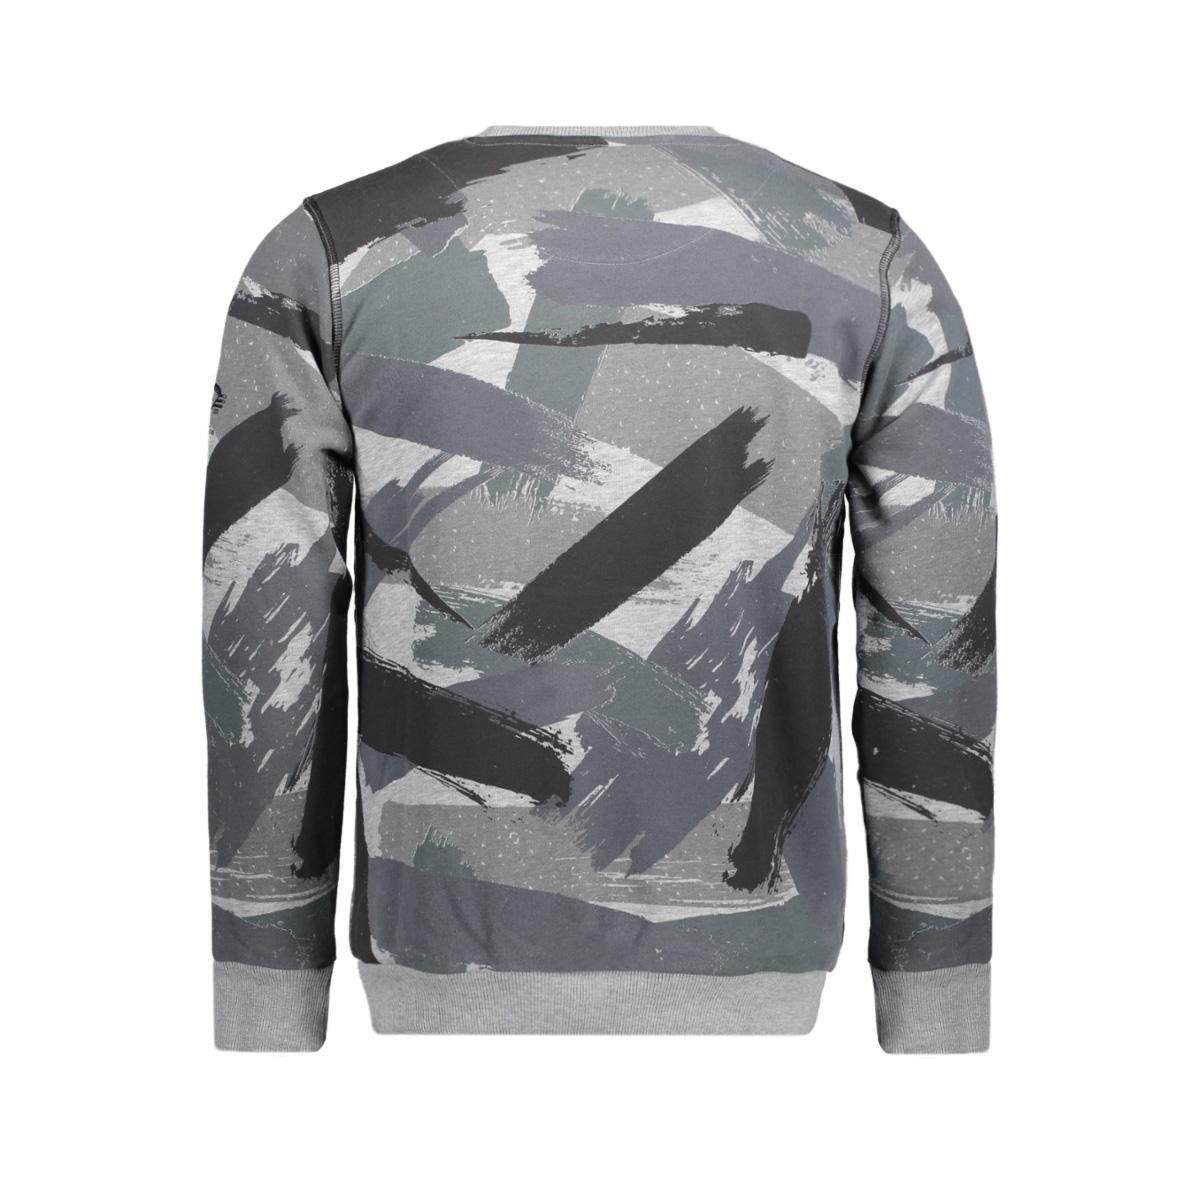 76103 gabbiano sweater grey